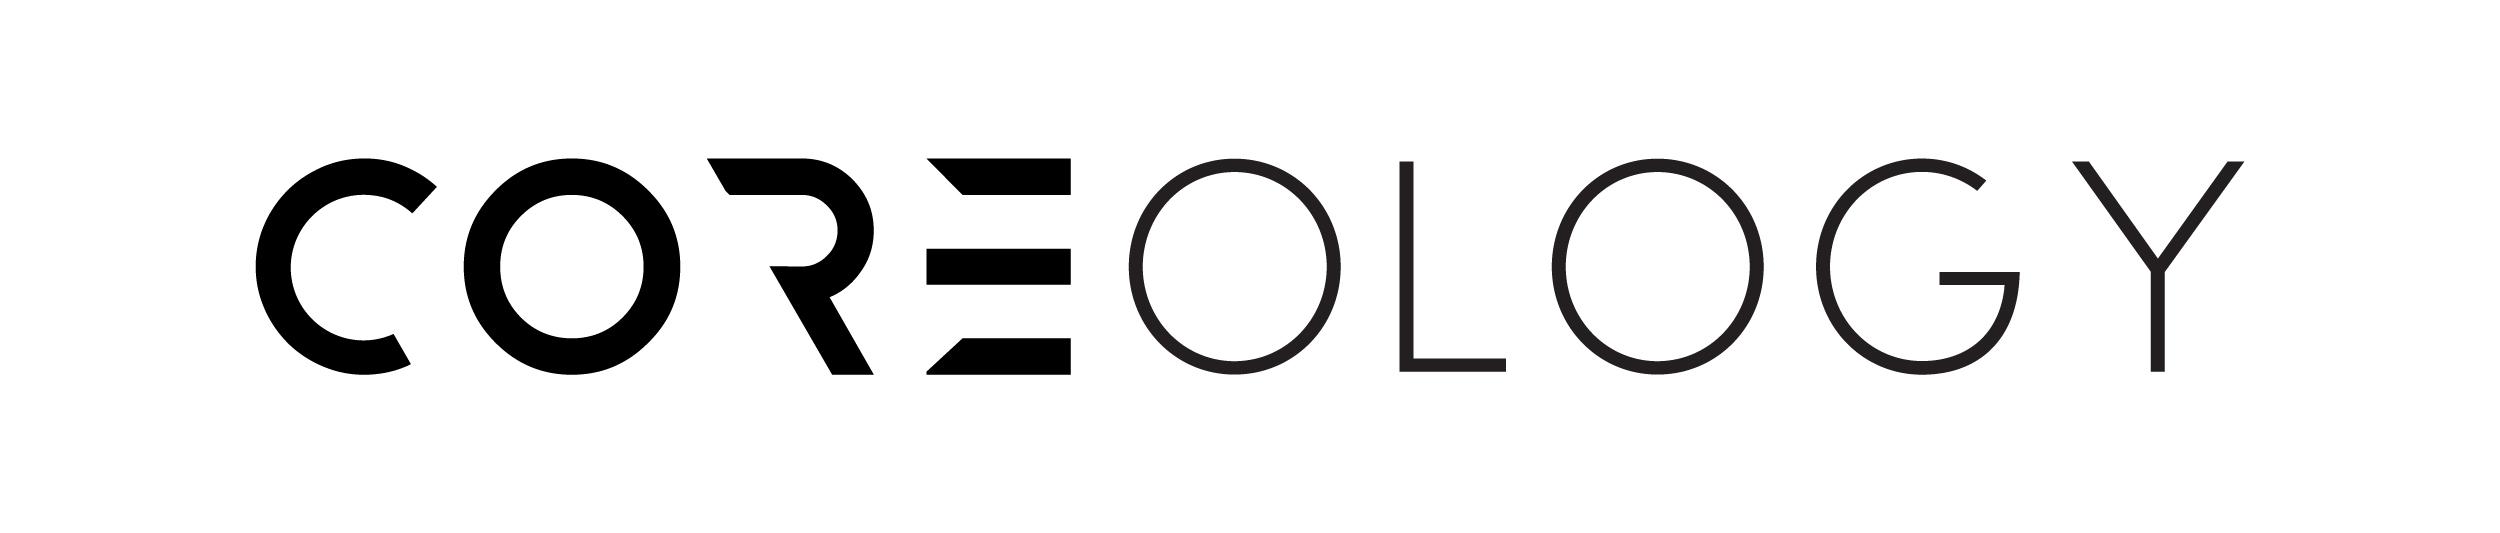 Horizontal, positive variation of the new logo.